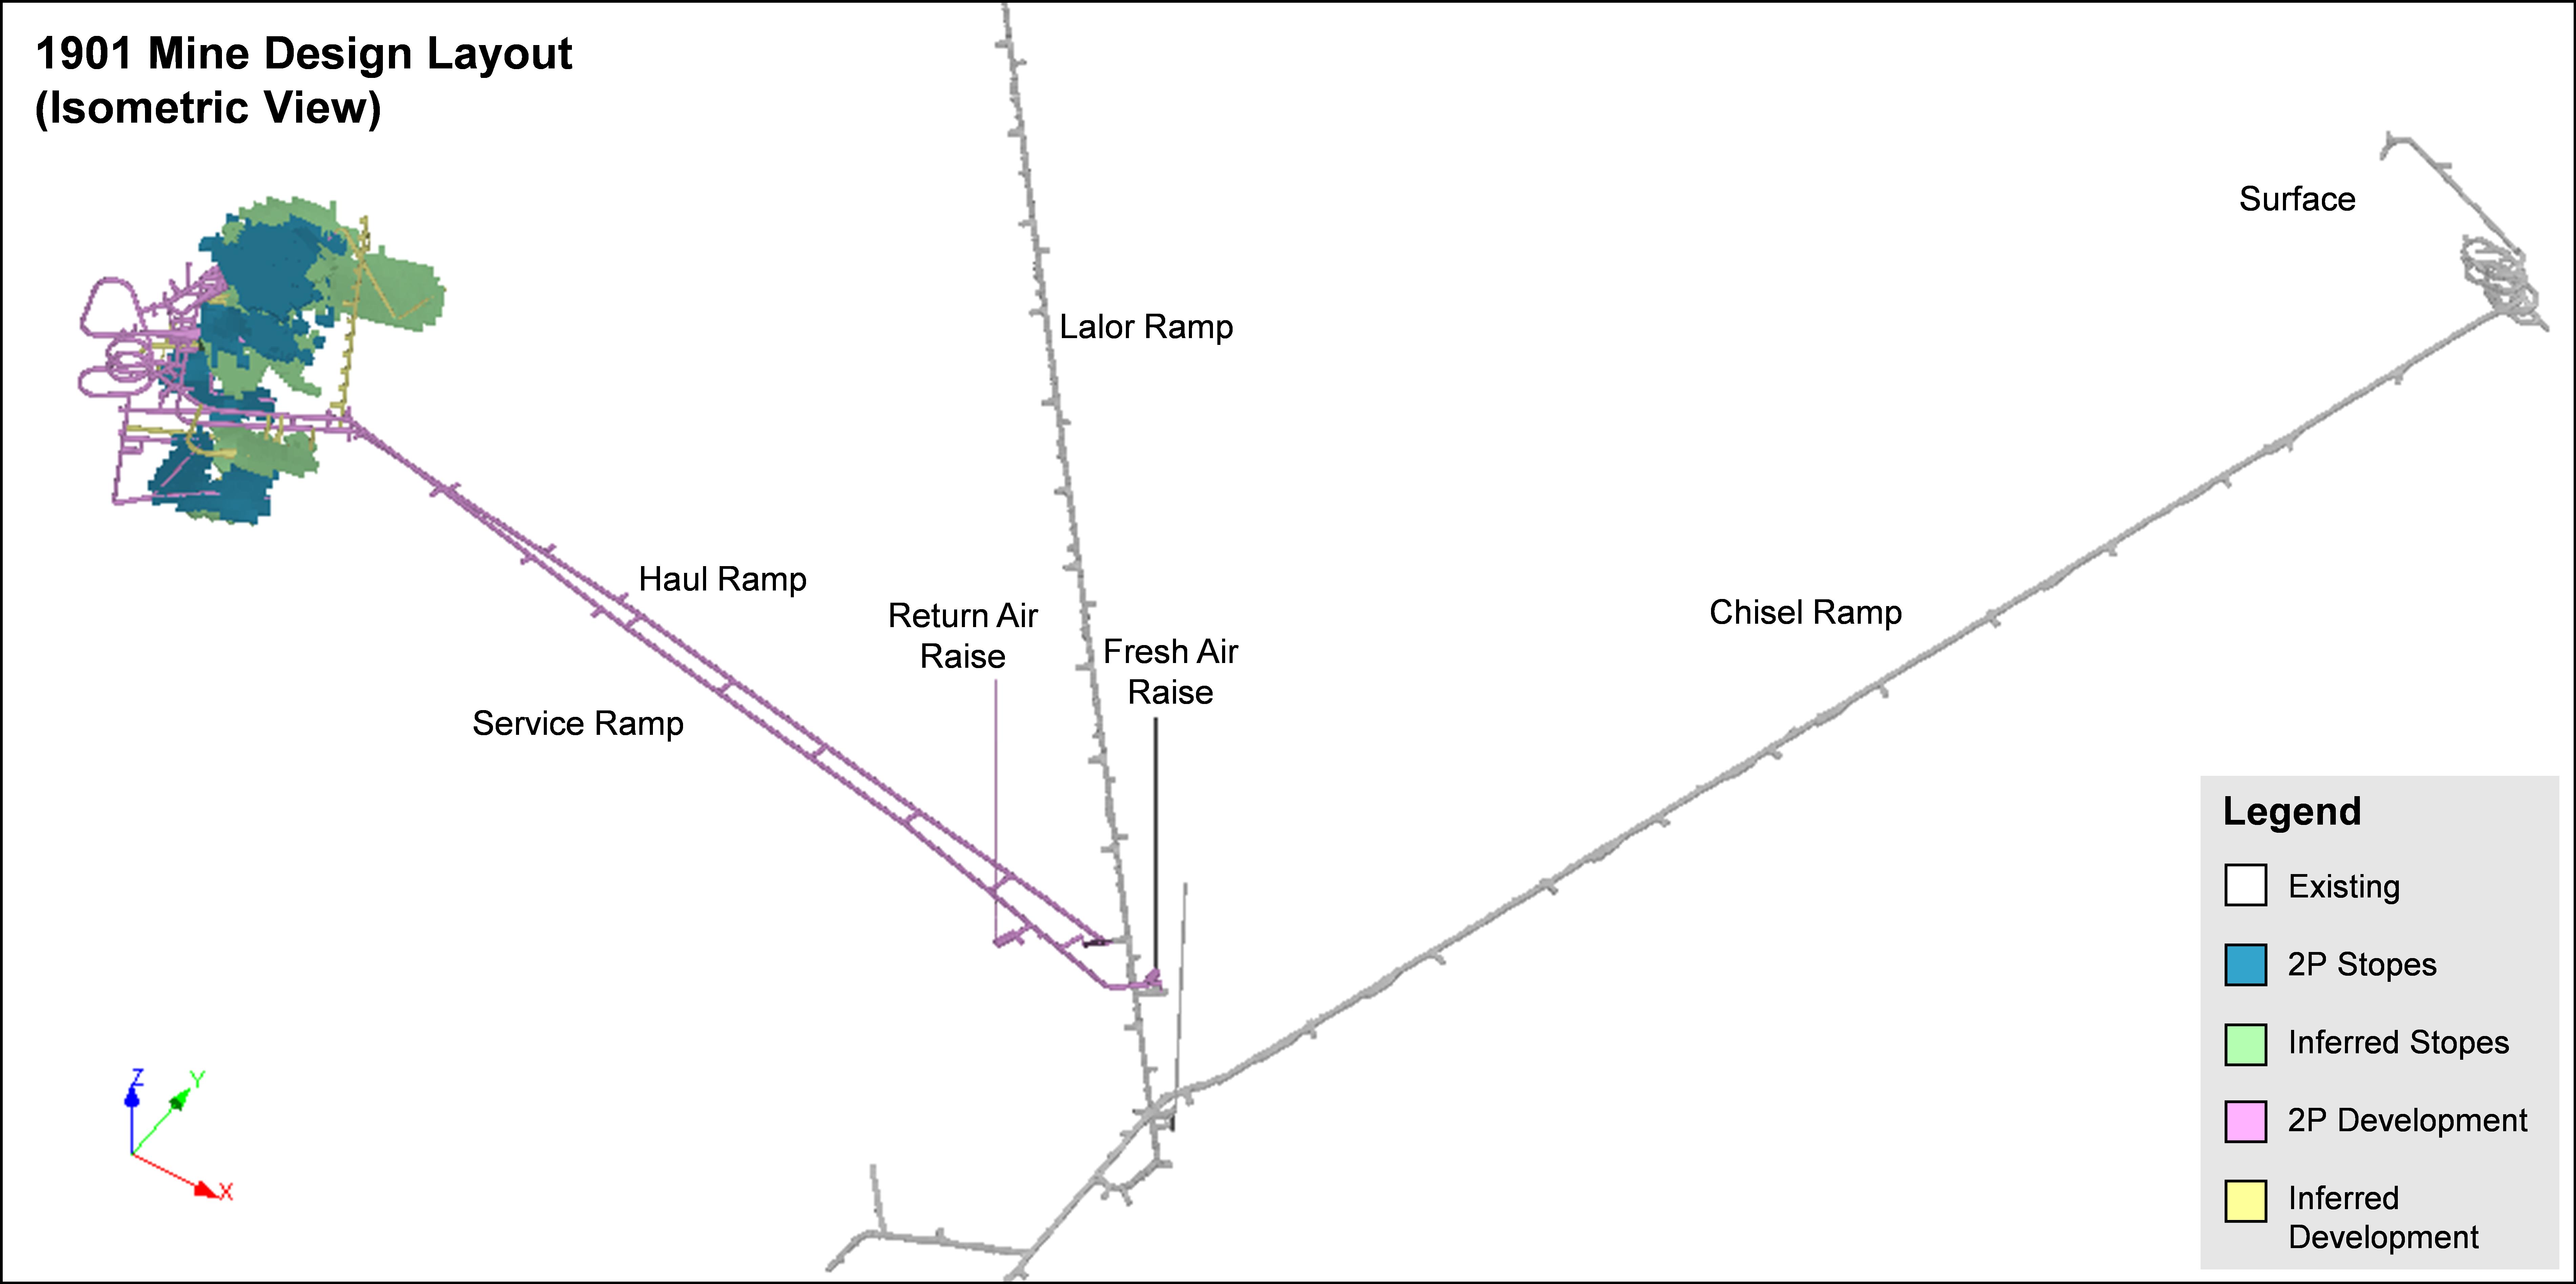 Figure 2: 1901 Mine Design Layout